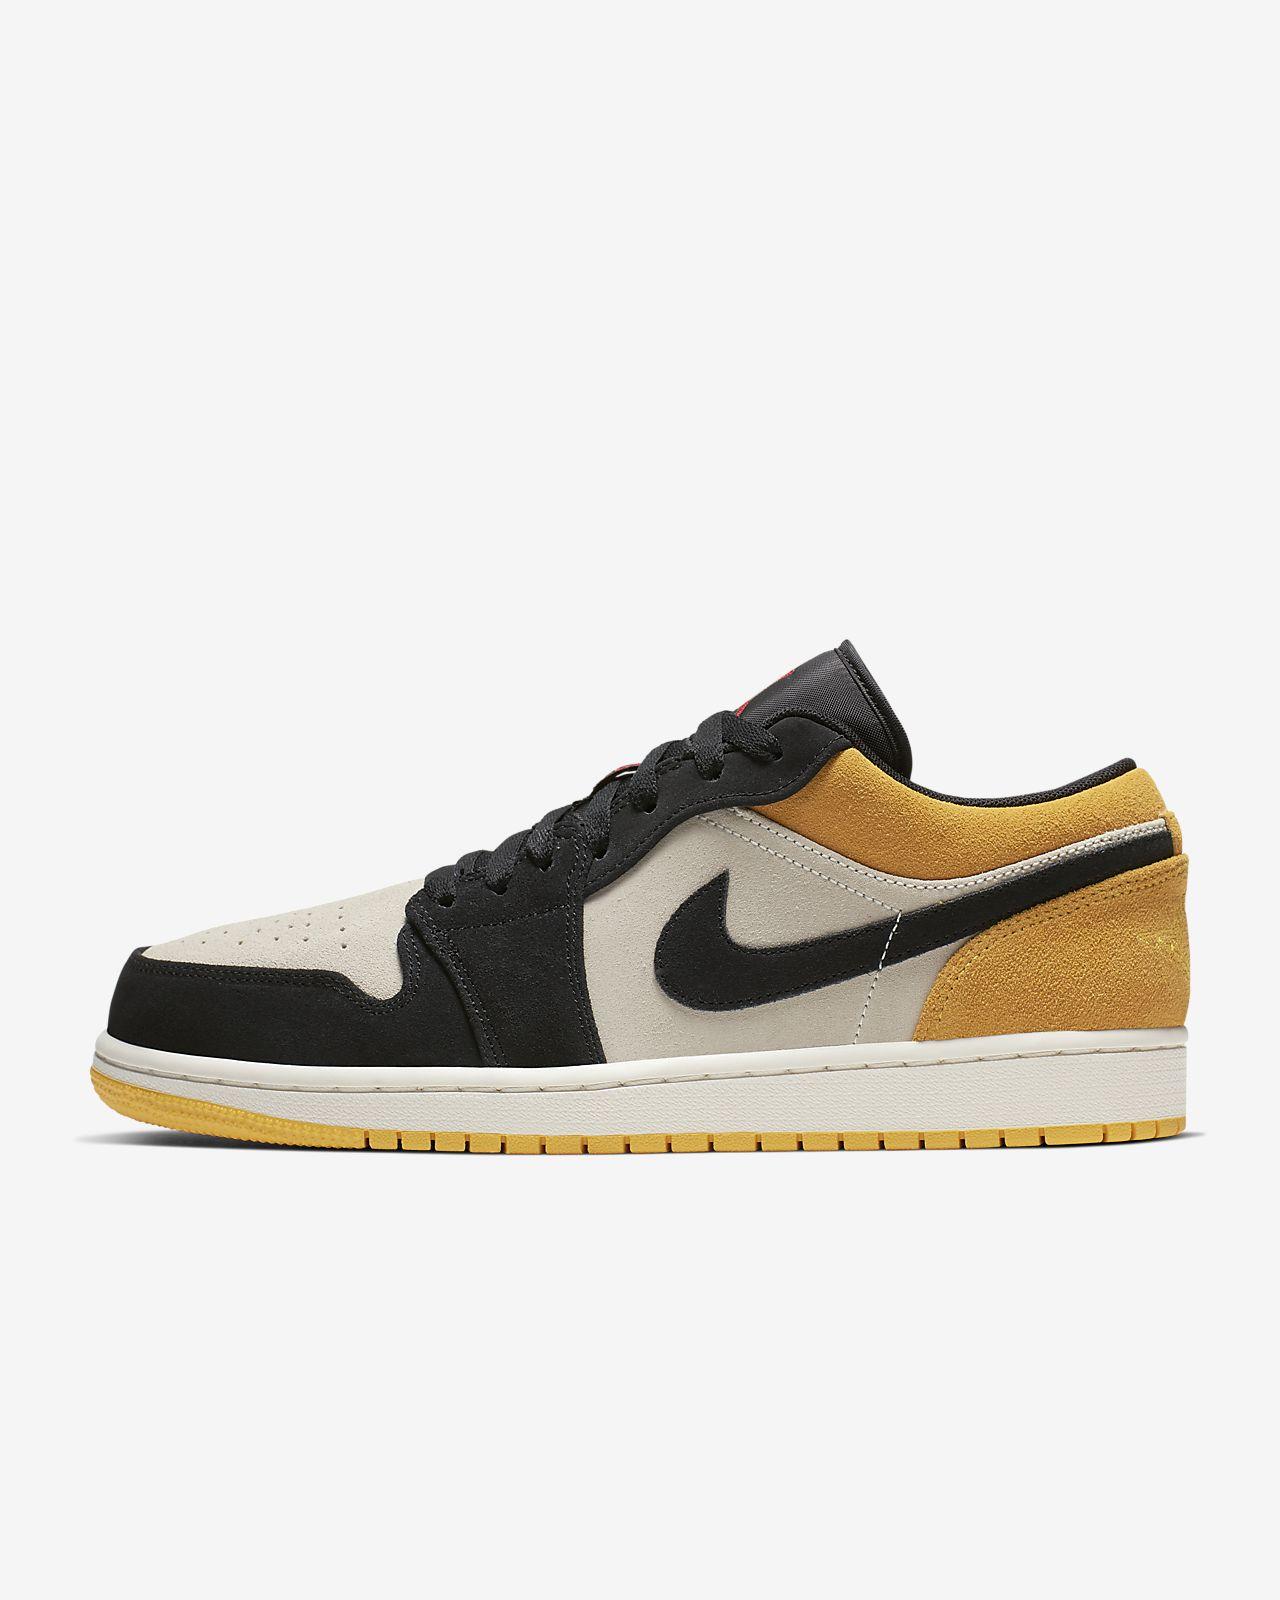 e210139a2df Chaussure Air Jordan 1 Low pour Homme. Nike.com CA